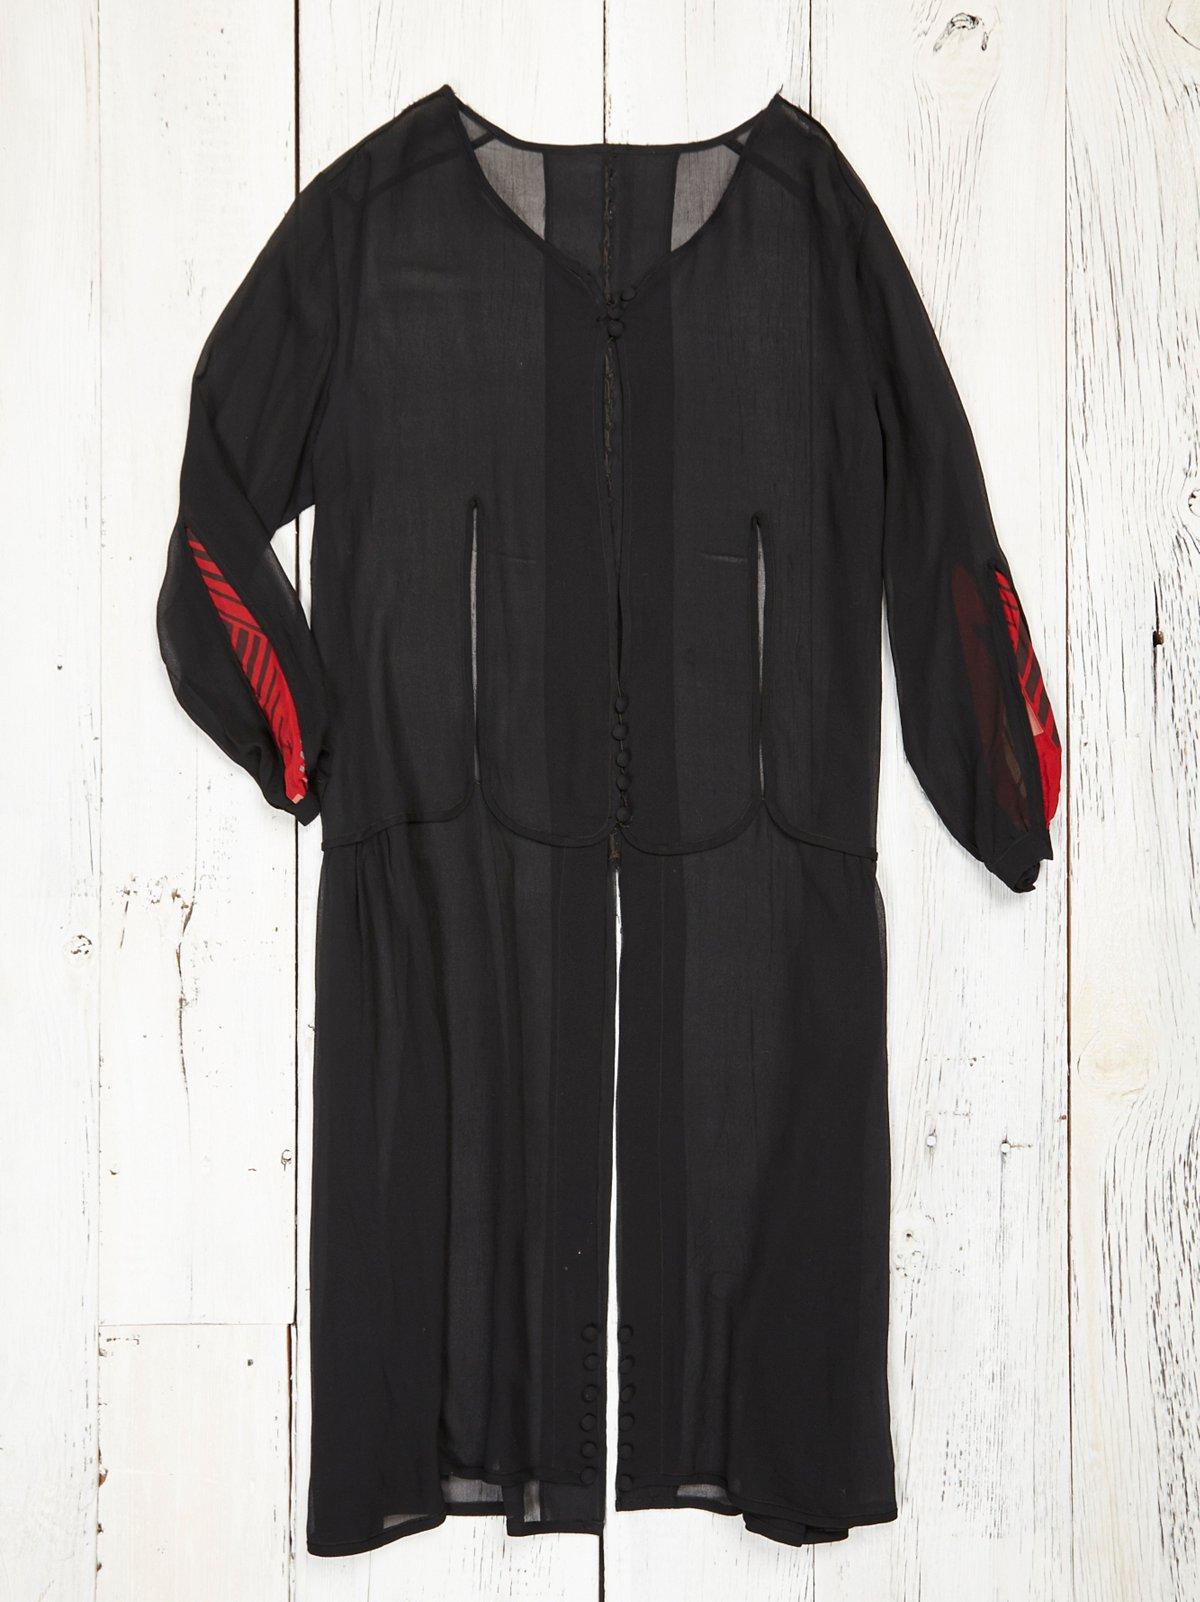 Vintage Black Chiffon Jacket